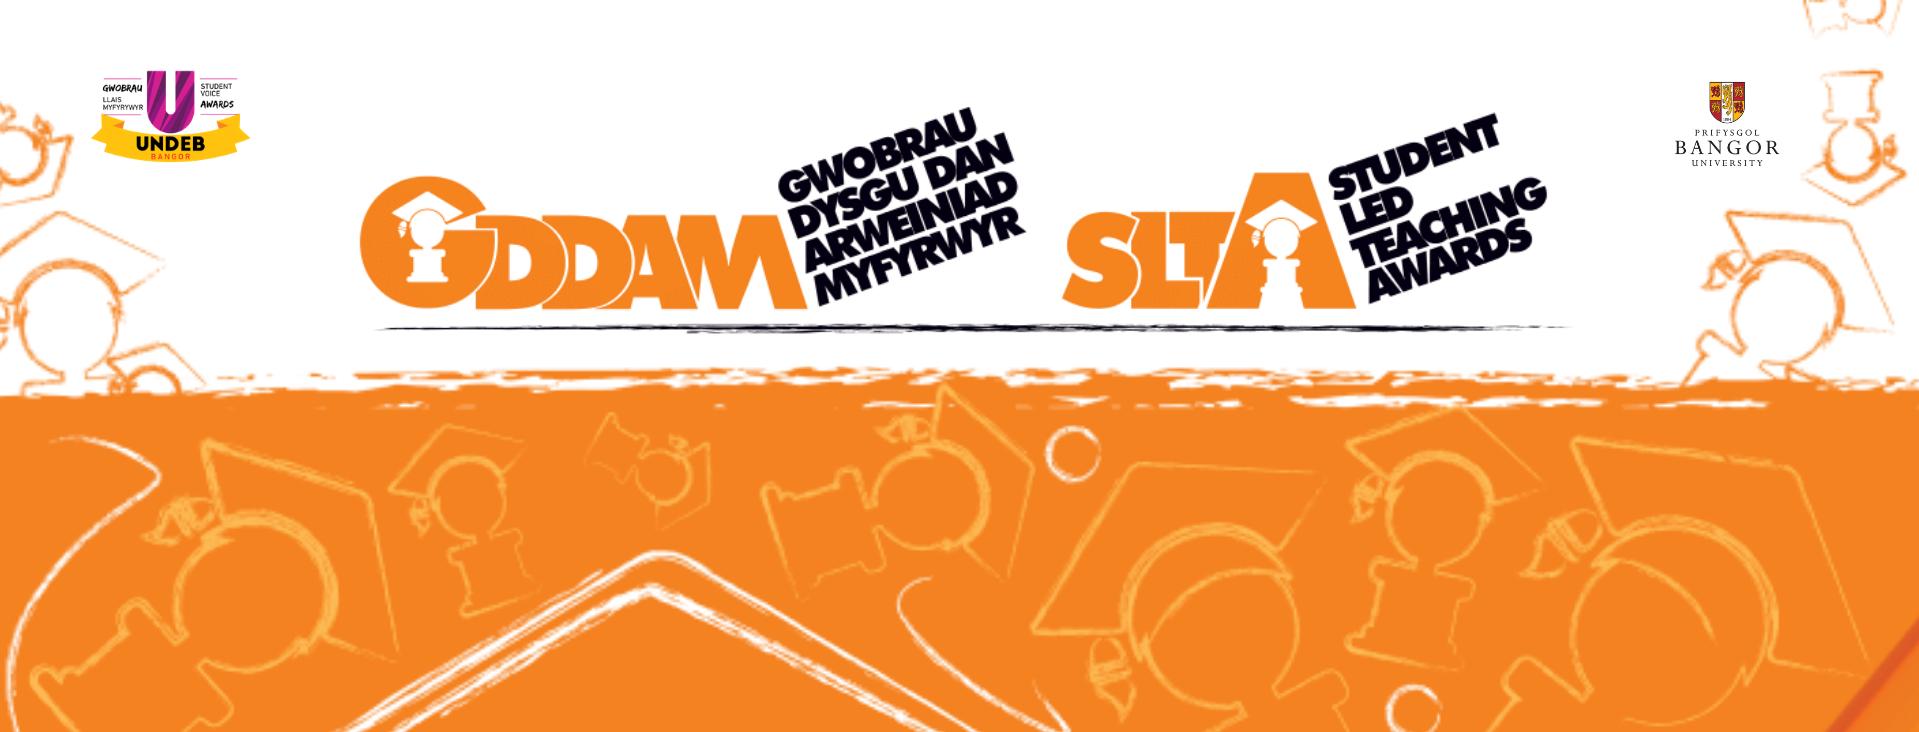 Sltas web banner